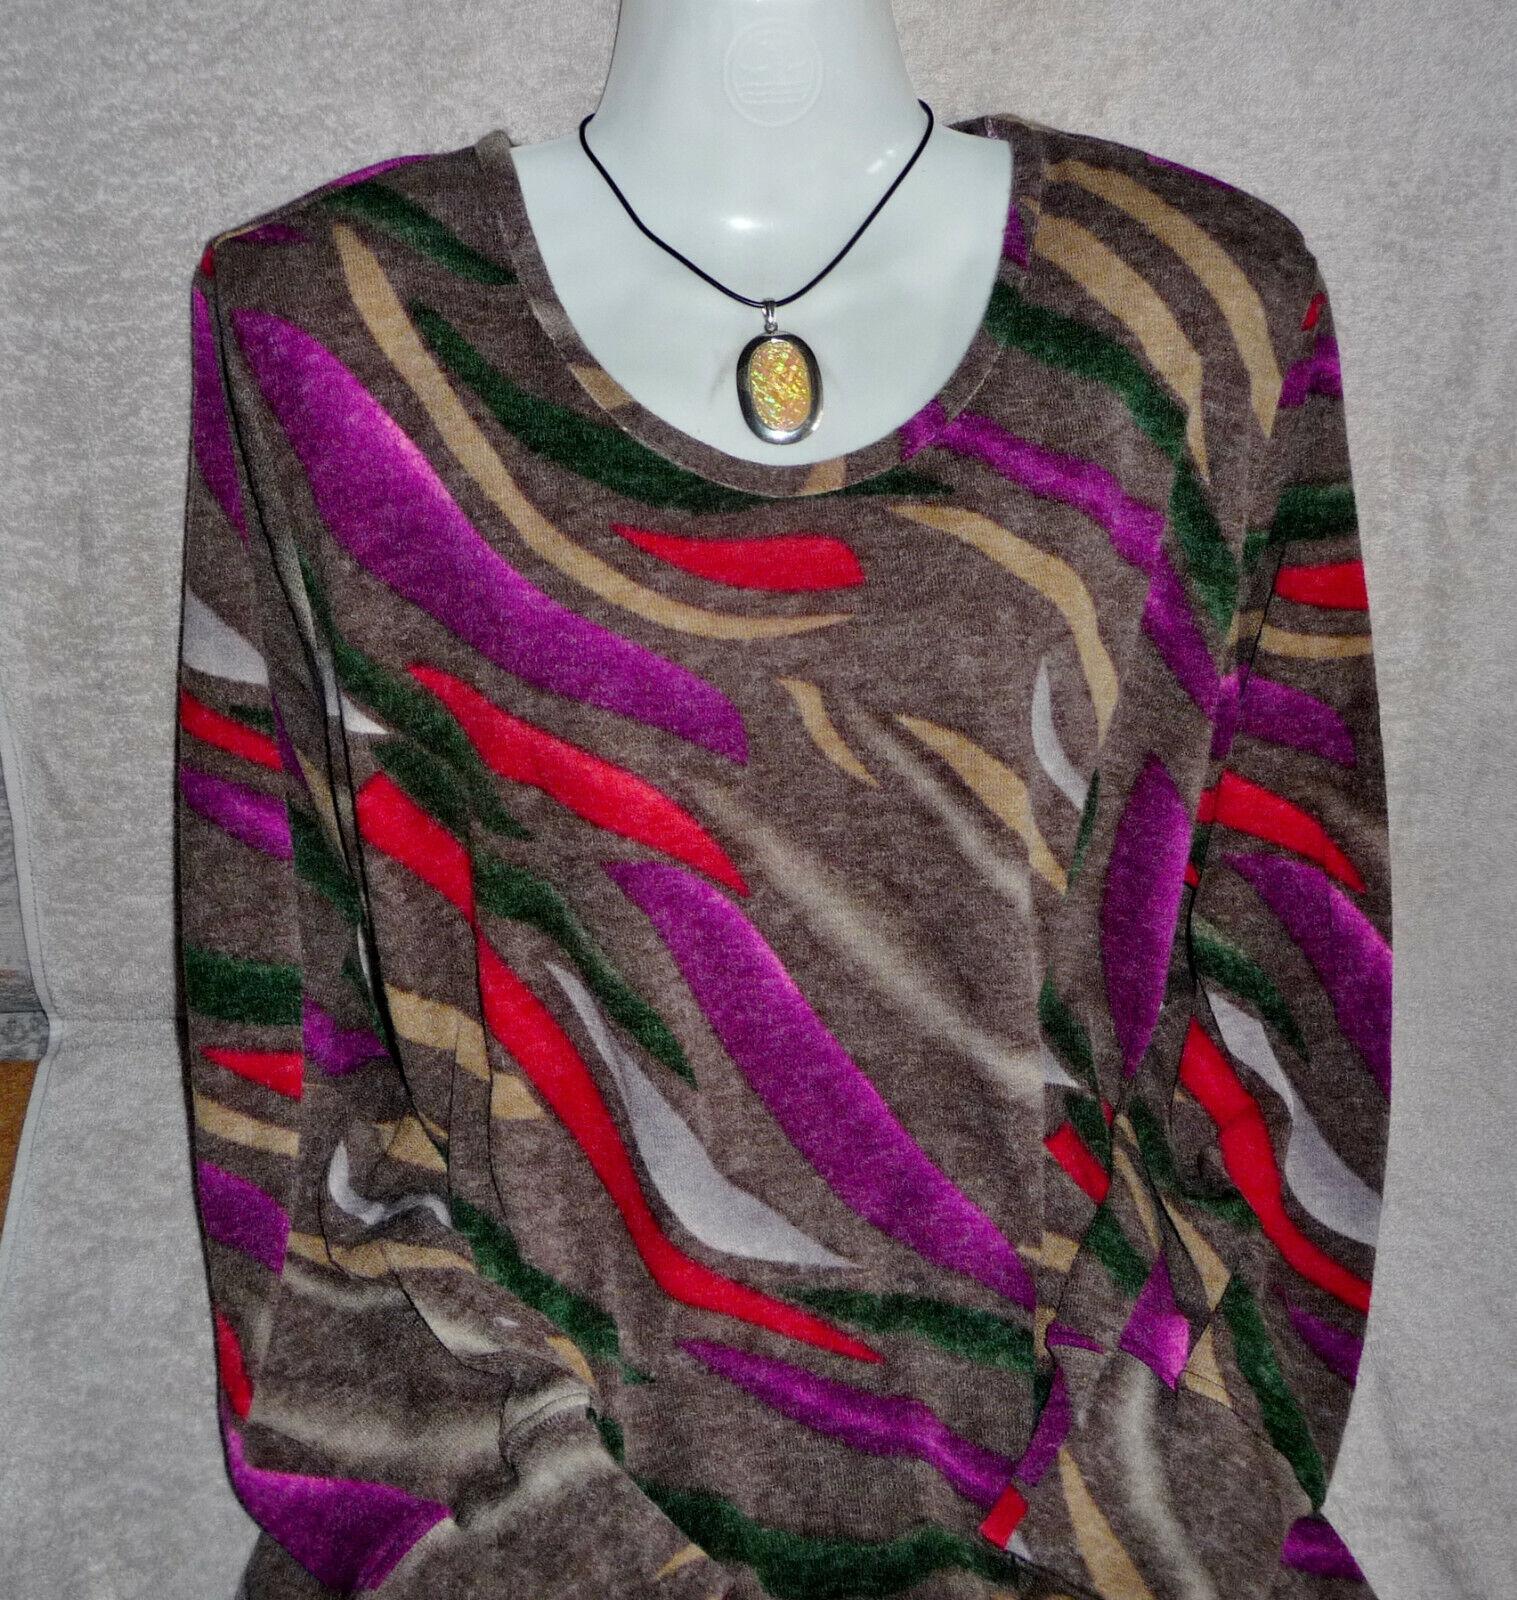 UNIKATDamen Shirtpulli,Langarm,48 50 52,Stoff mit Wolleanteil,selbst genäht,NEU